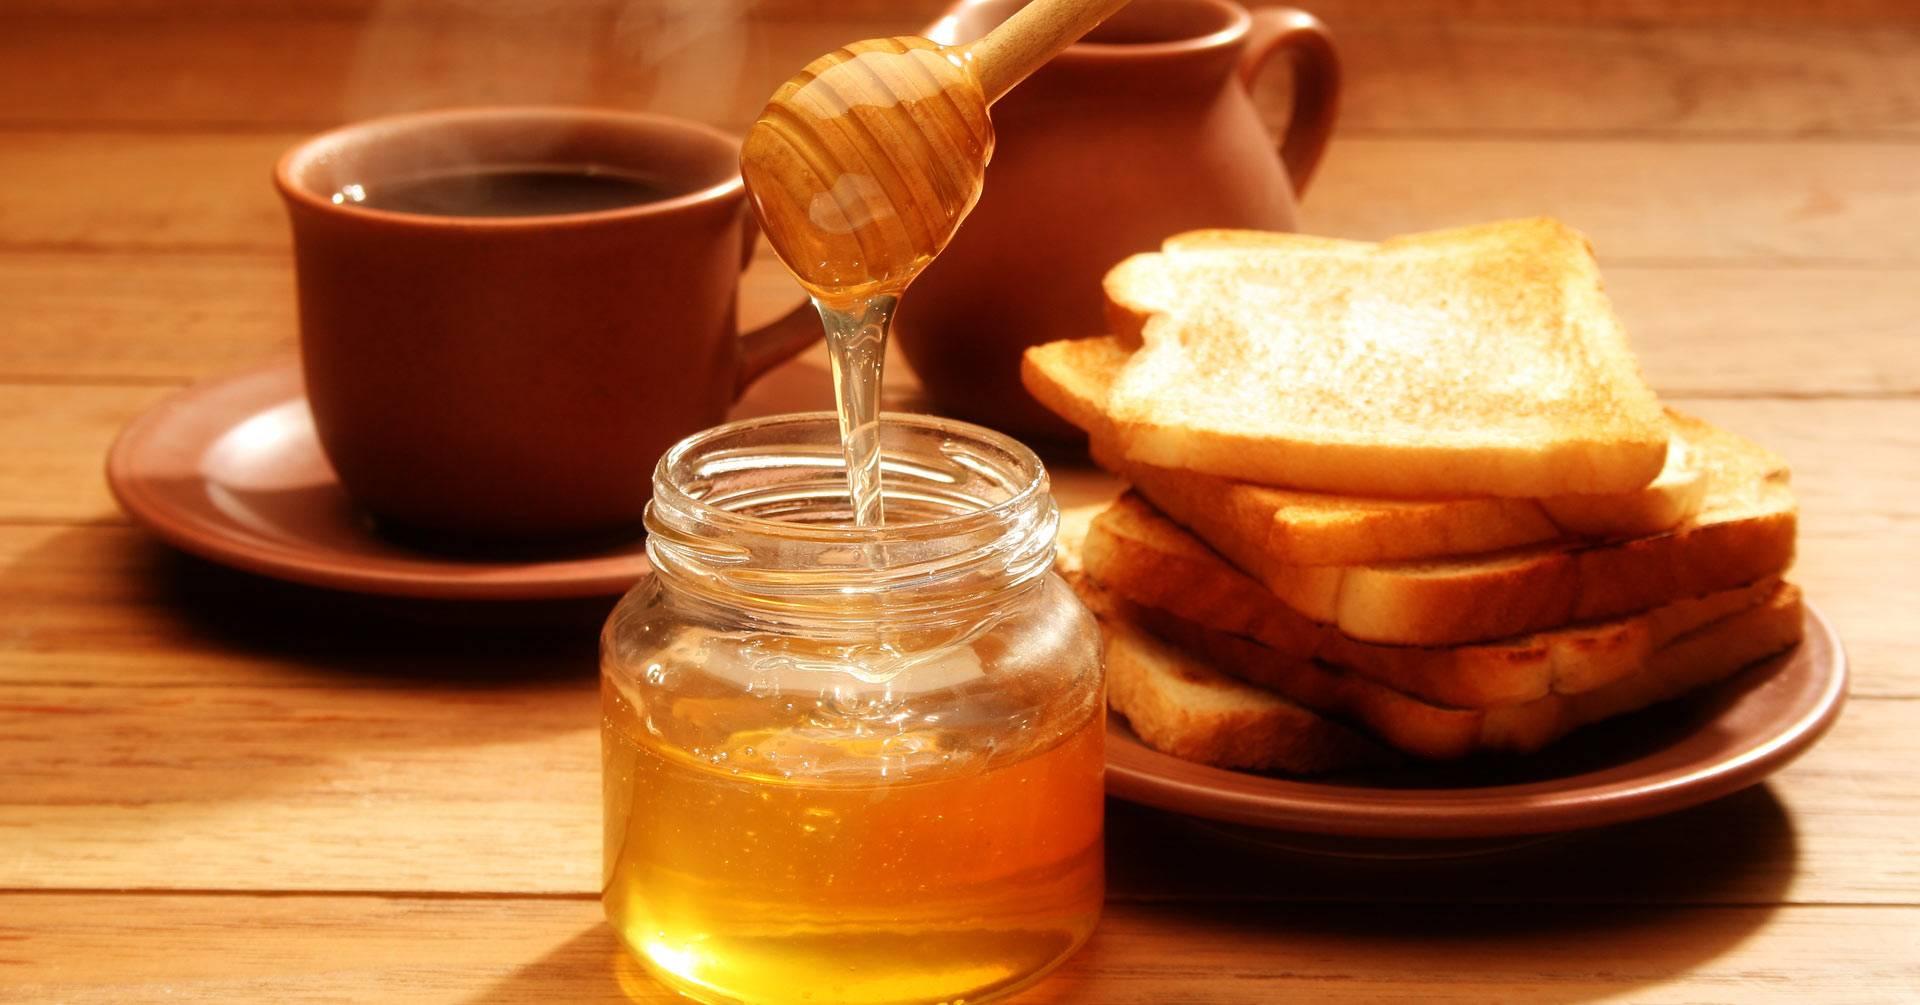 Мед при хроническом панкреатите